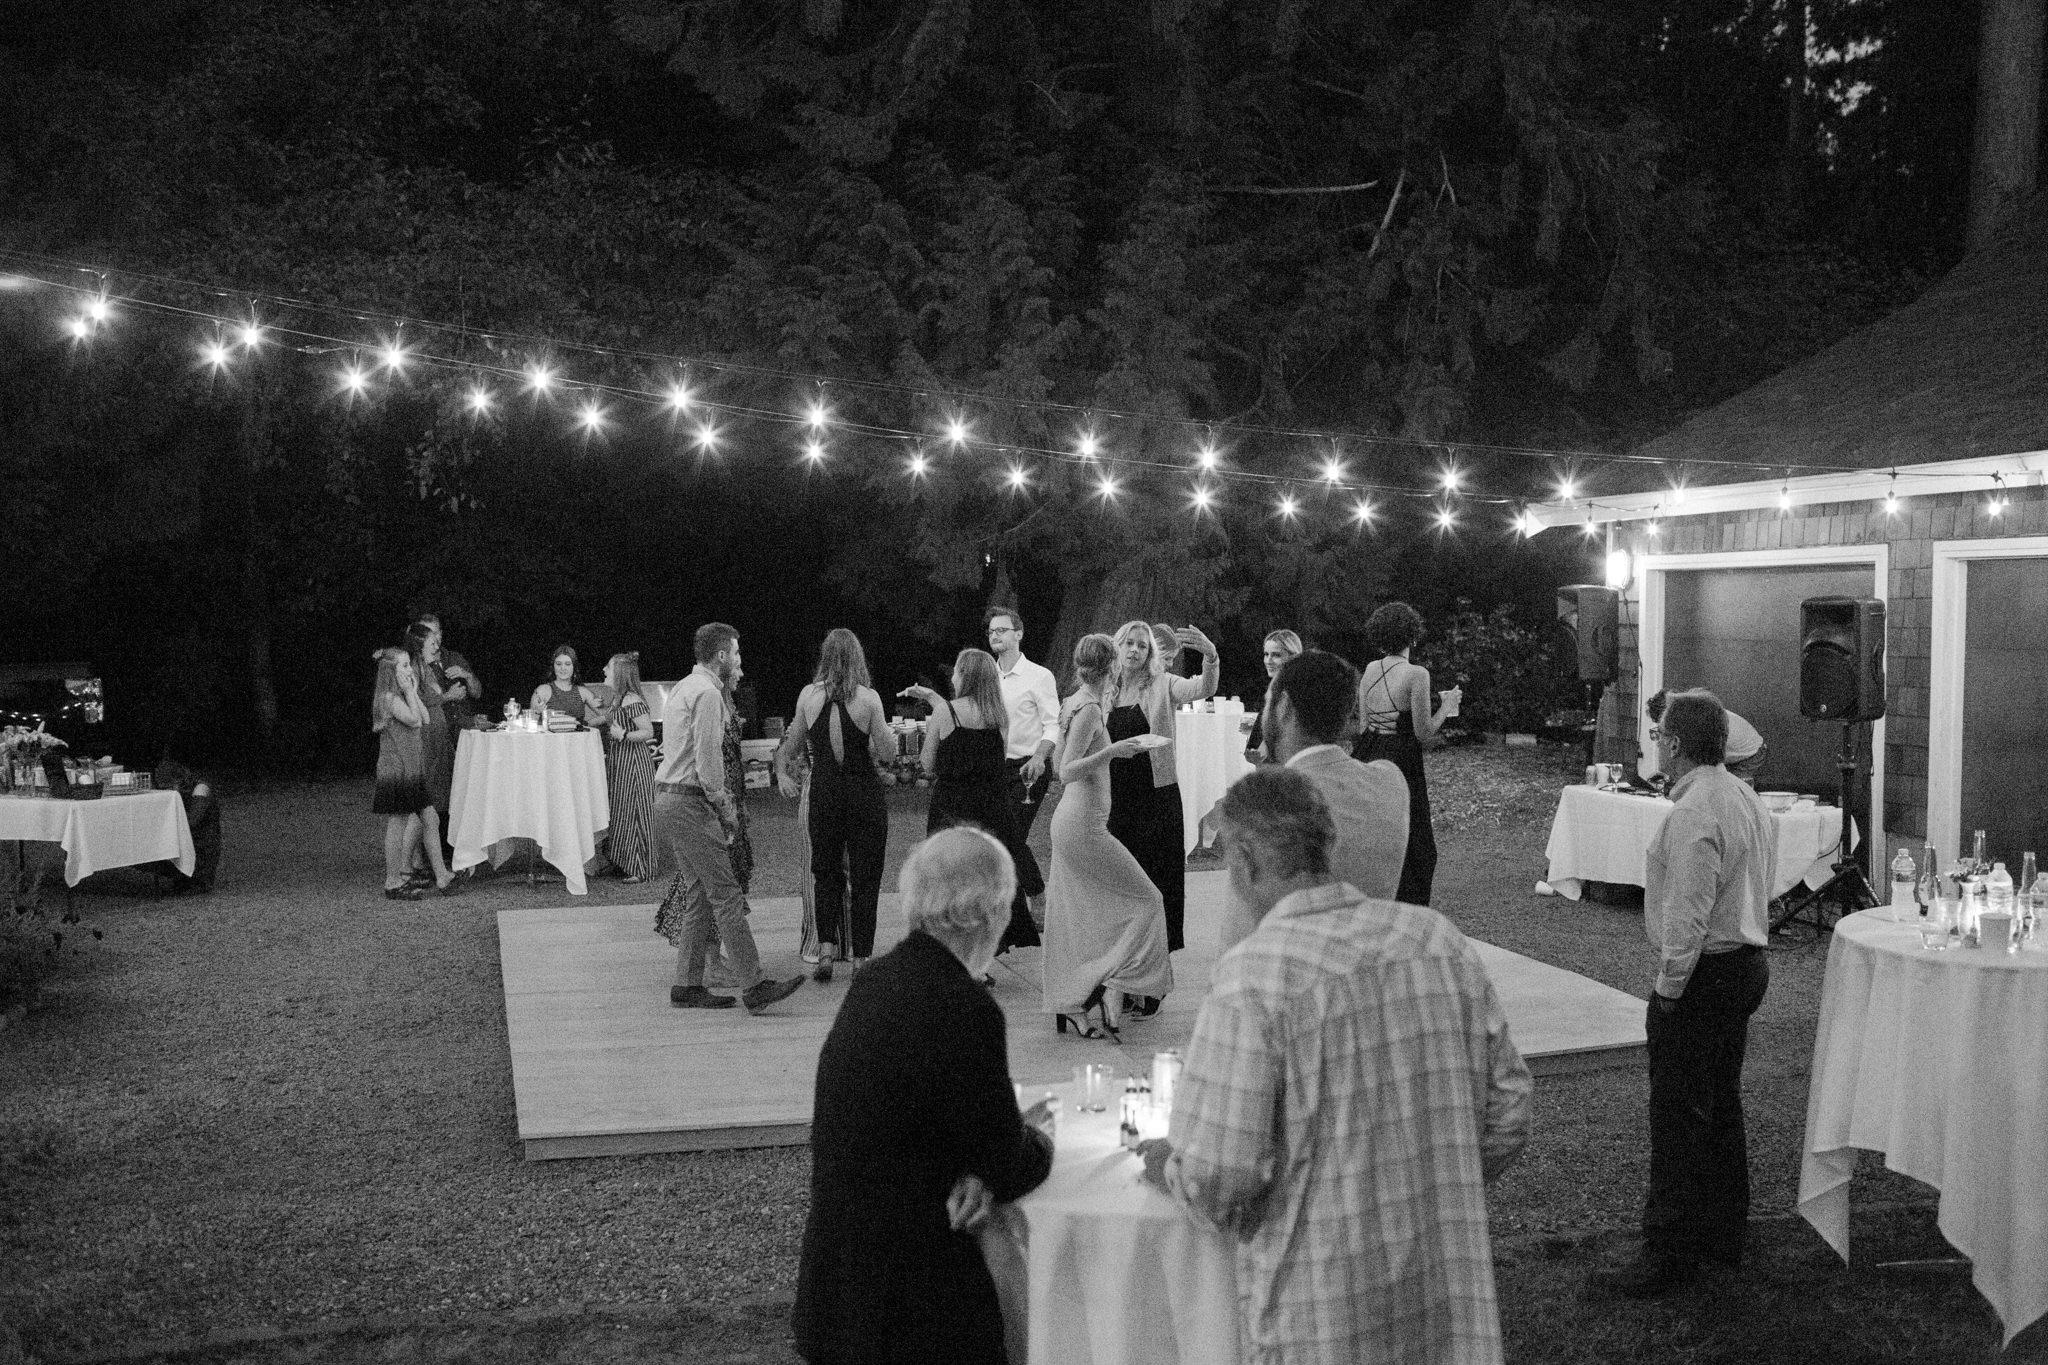 Backyard-Bainbridge-Island-Wedding-Alycia-Lovell-Photography-255.JPG